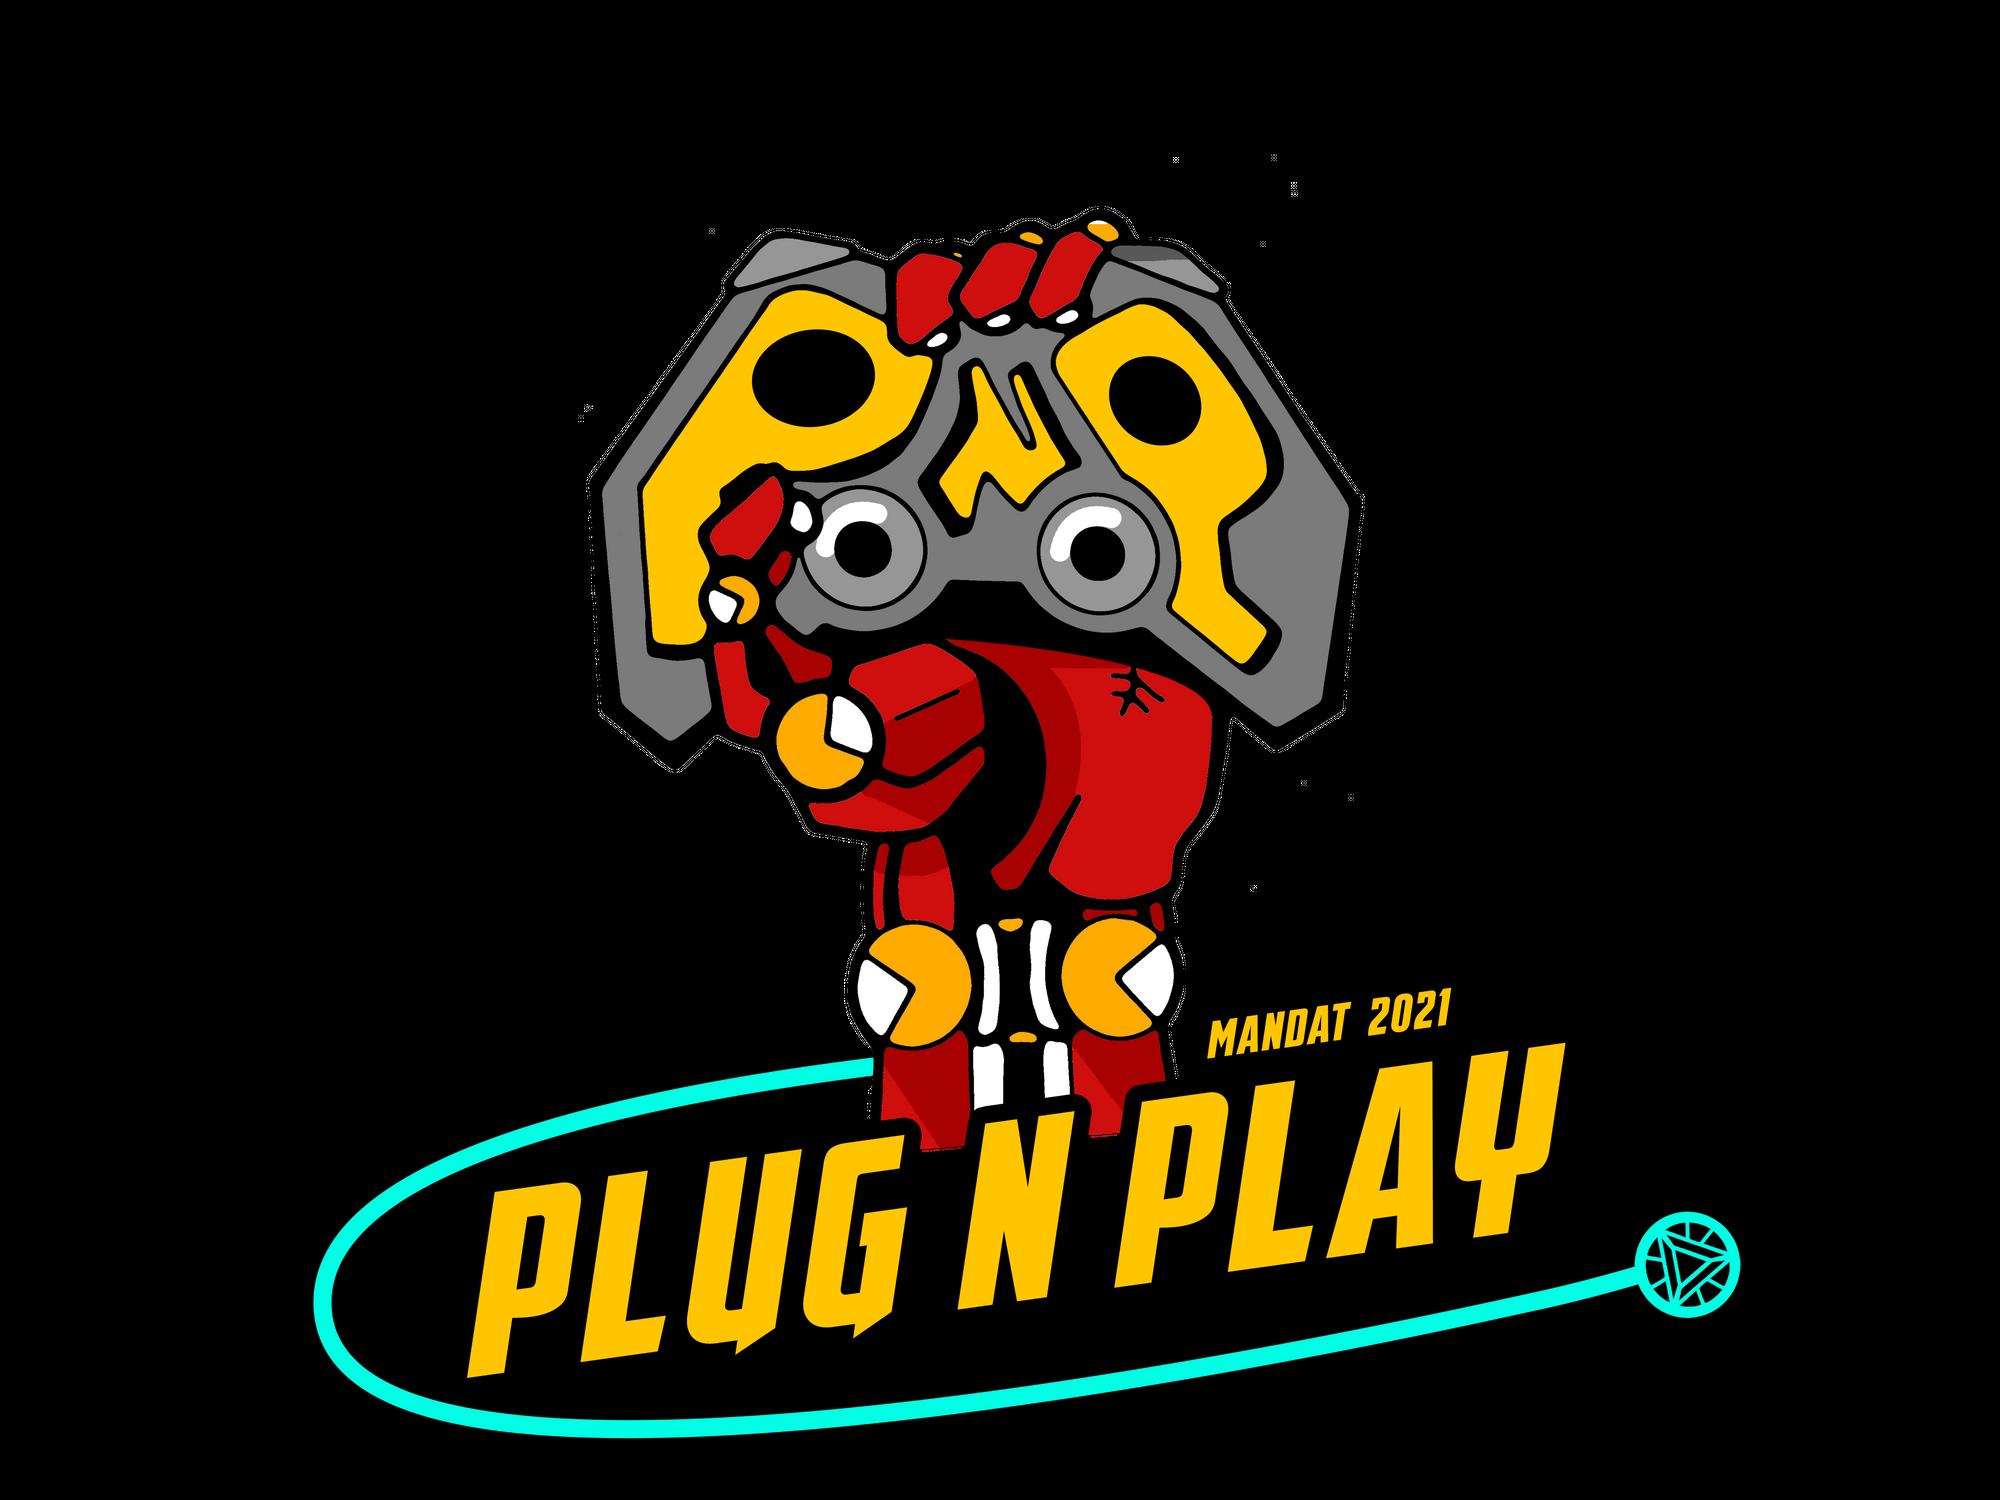 Plug'n'Play